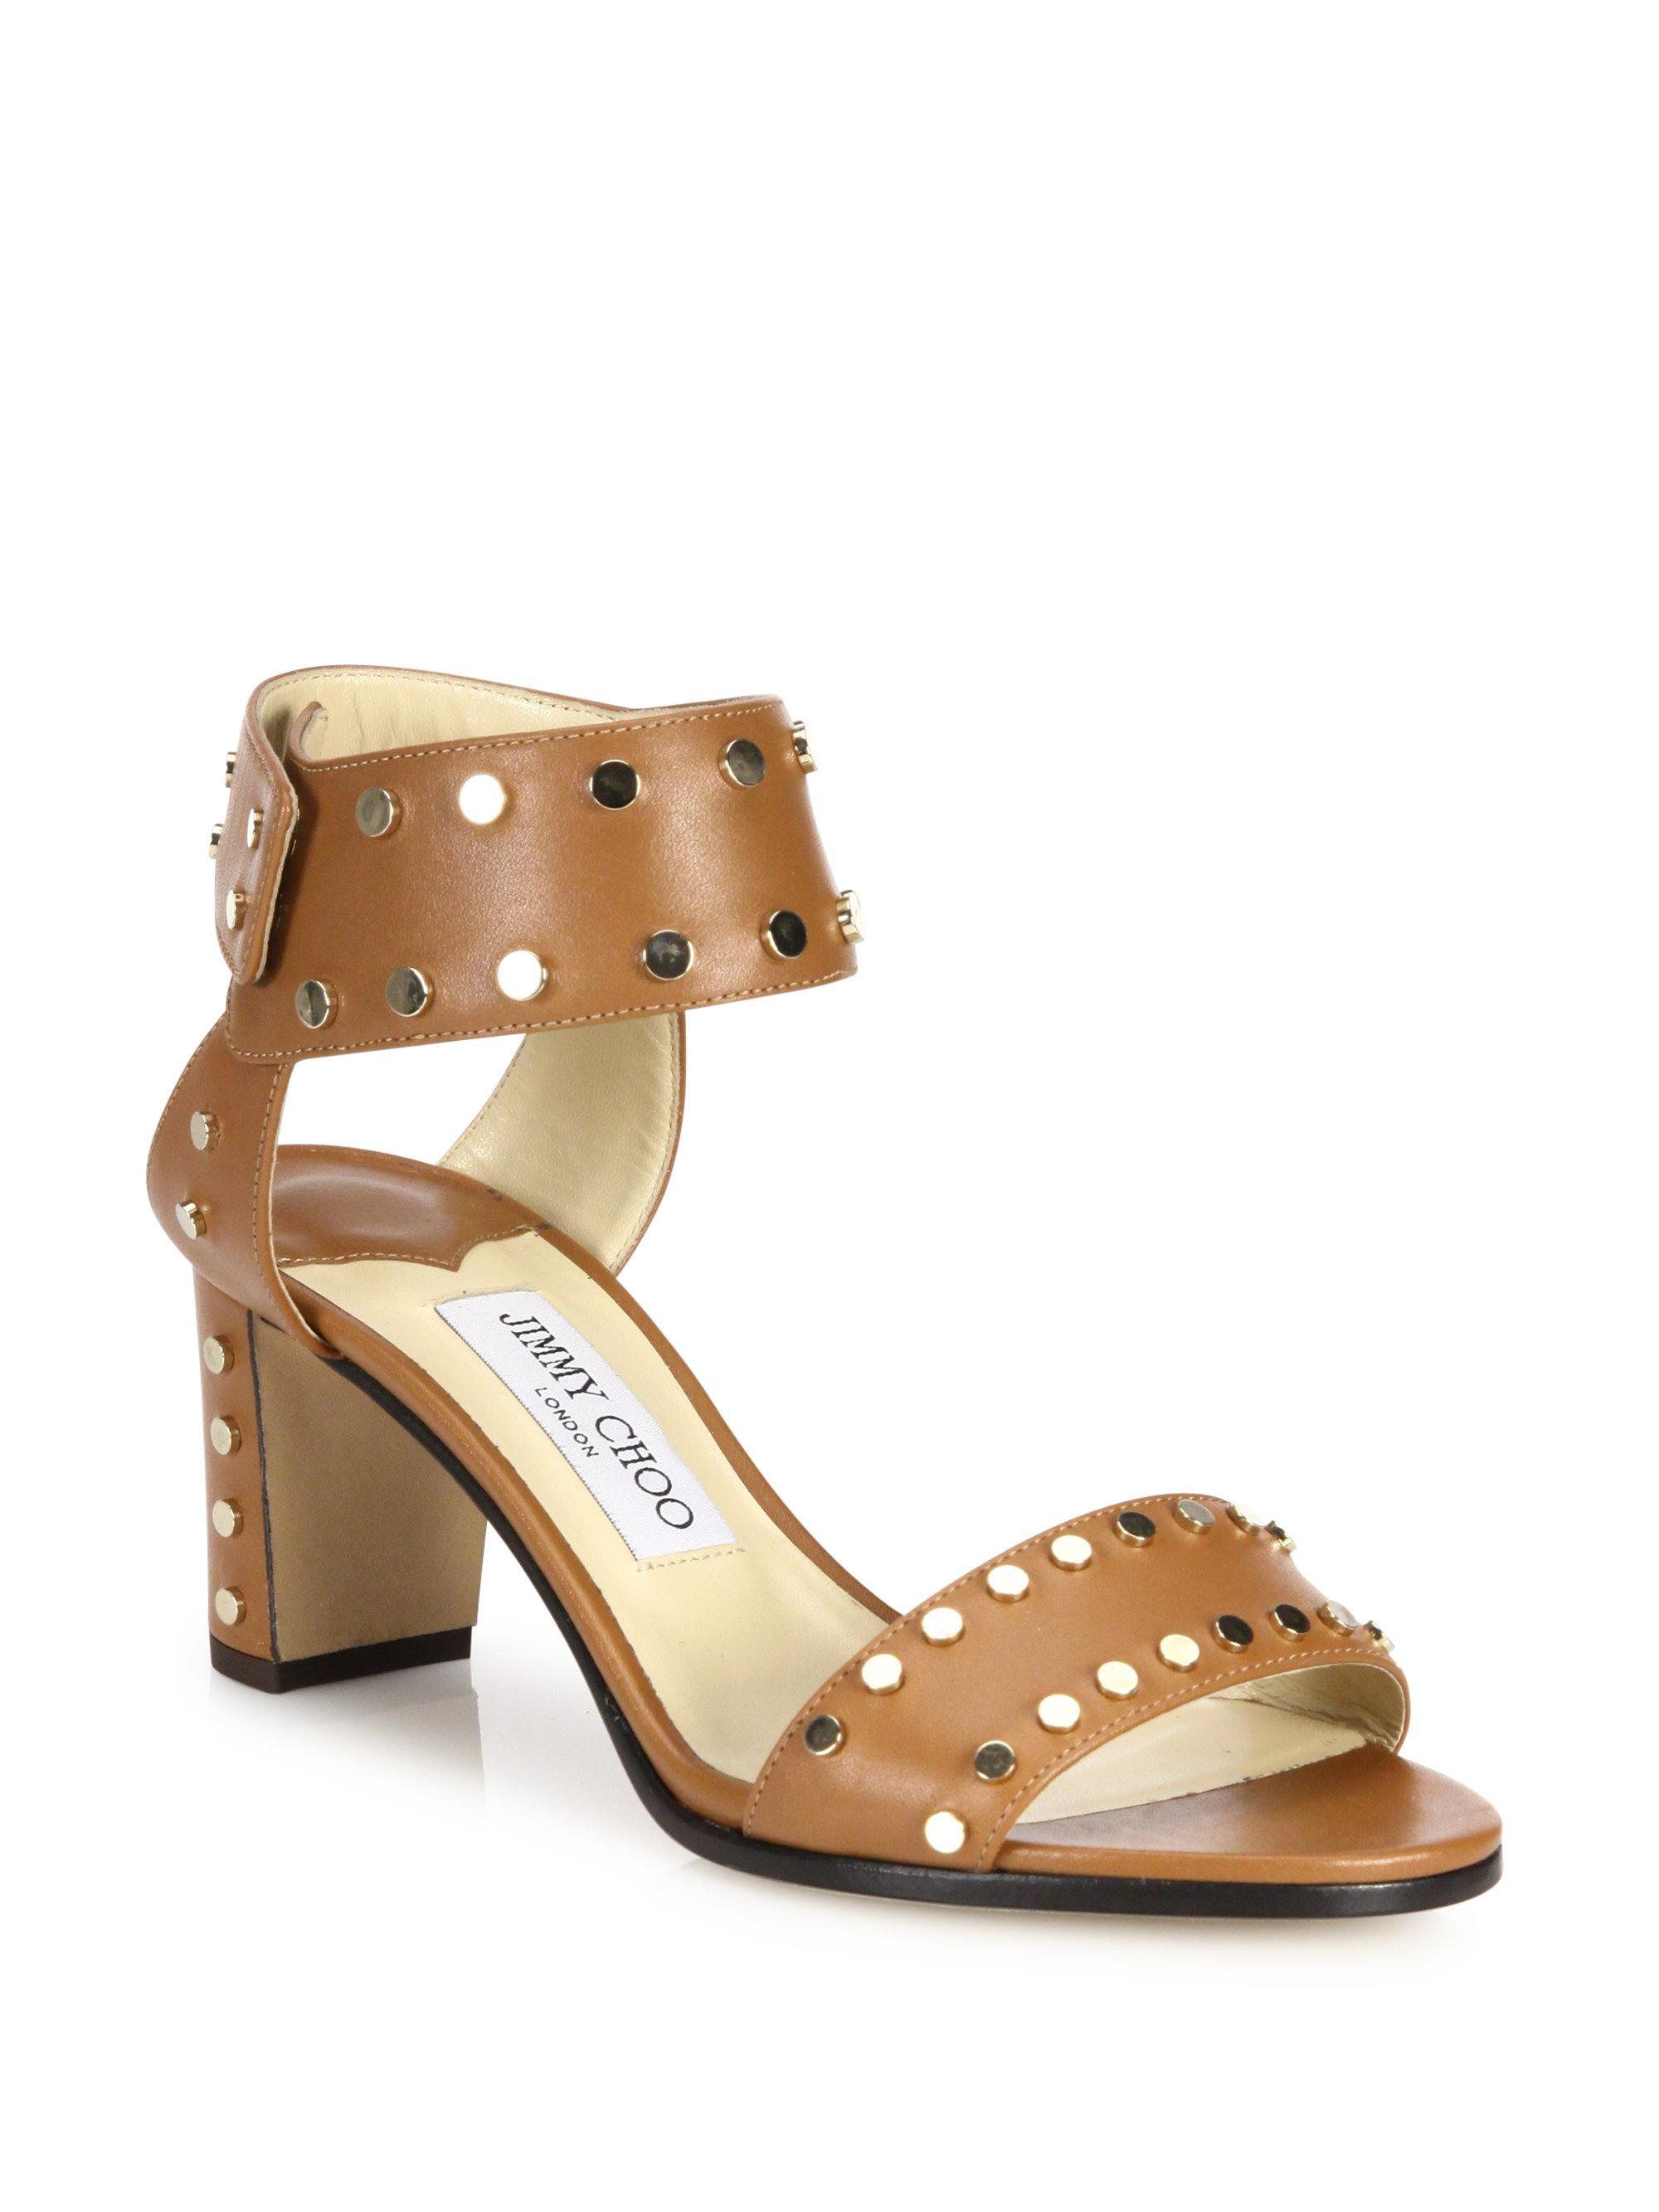 0fb6165136b8 Lyst - Jimmy Choo Veto 65 Studded Leather Block Heel Sandals in Brown